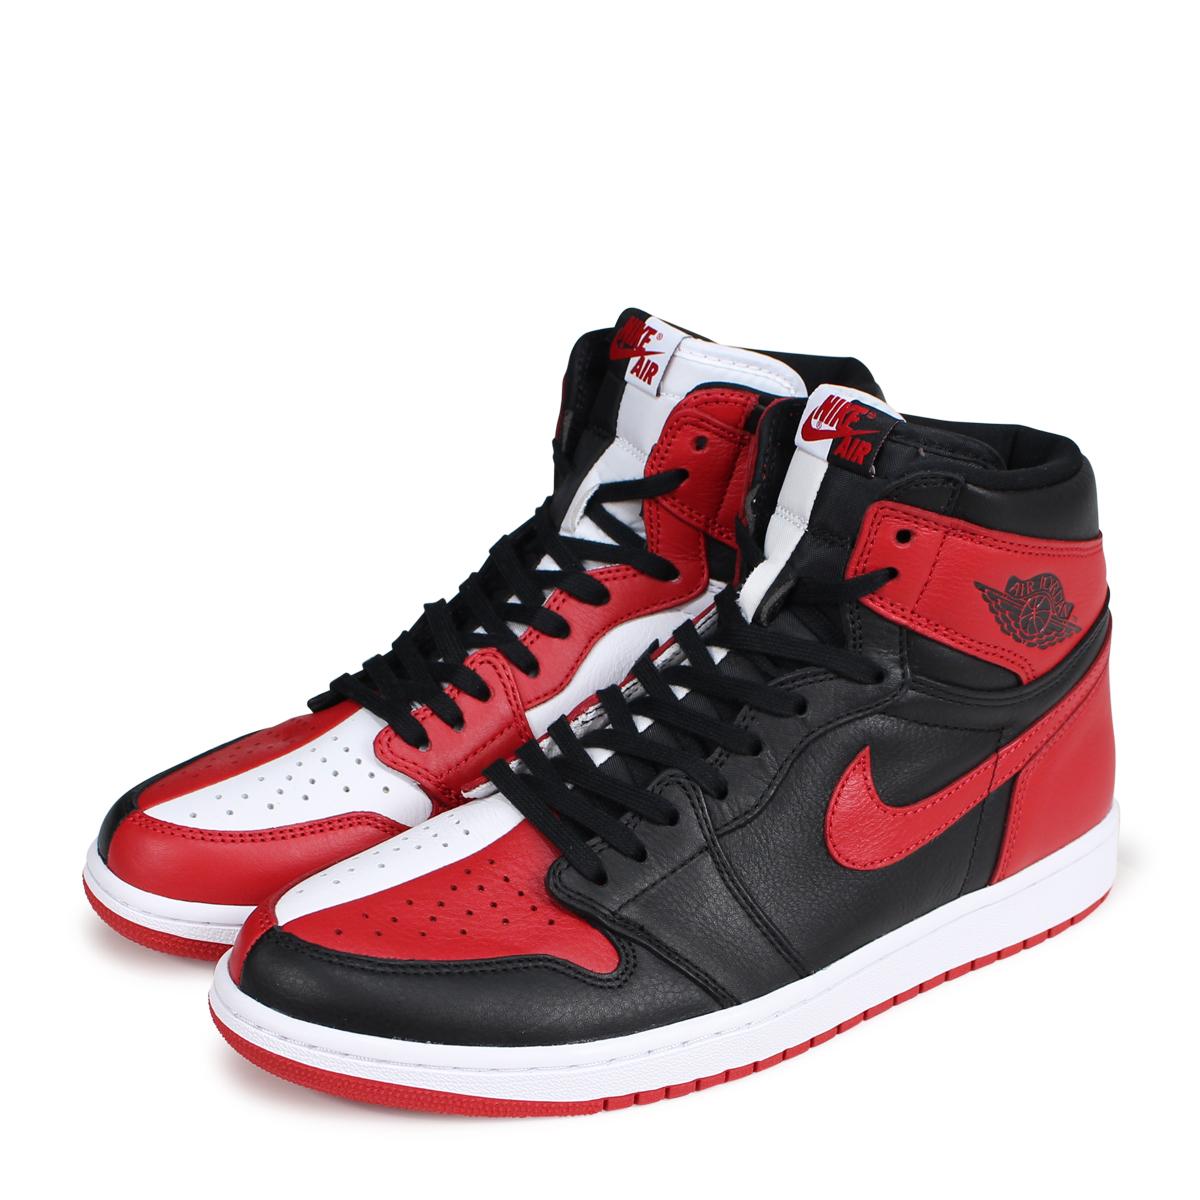 cheaper d0a3b 50a7d NIKE AIR JORDAN 1 RETRO HIGH OG HOMAGE TO HOME Nike Air Jordan 1 nostalgic  high men gap Dis sneakers 861,428-061 red [9/6 Shinnyu load] [189]